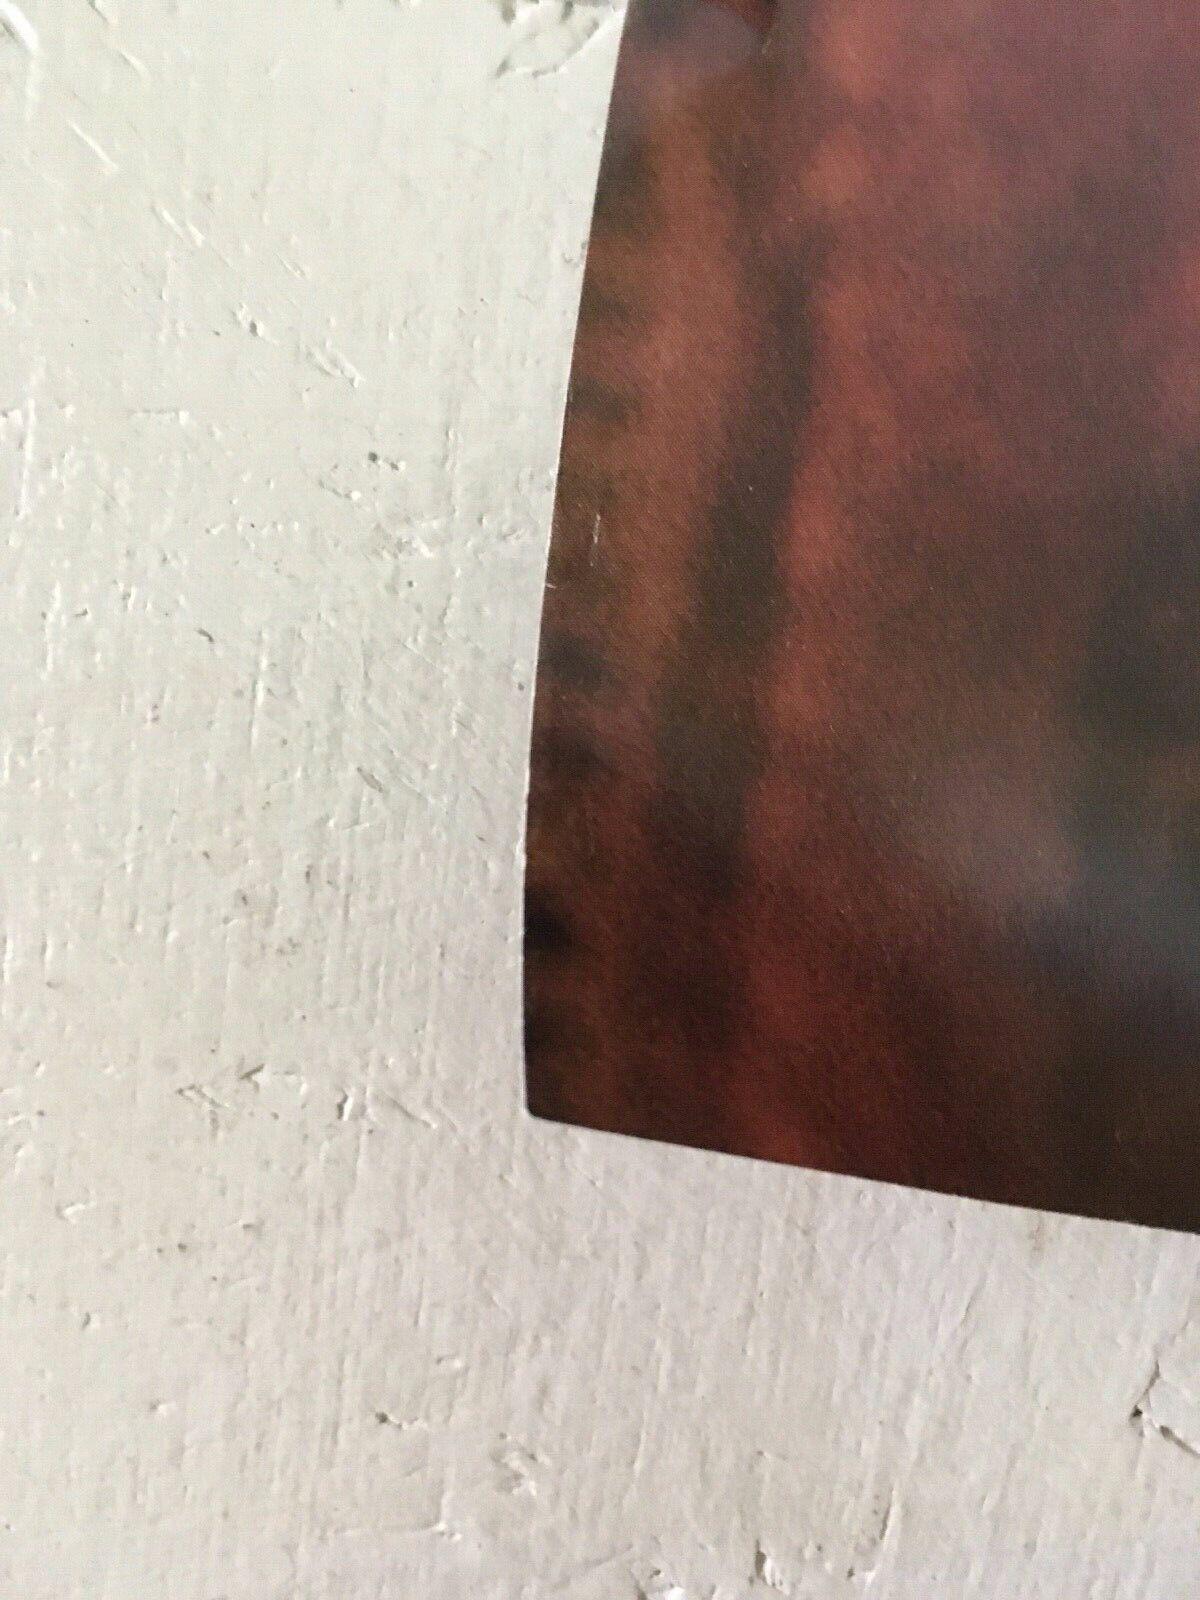 STING - 1993 Police BoxSet- Ten Summoner s Tales- Demolition Man - Promo Poster - $7.99